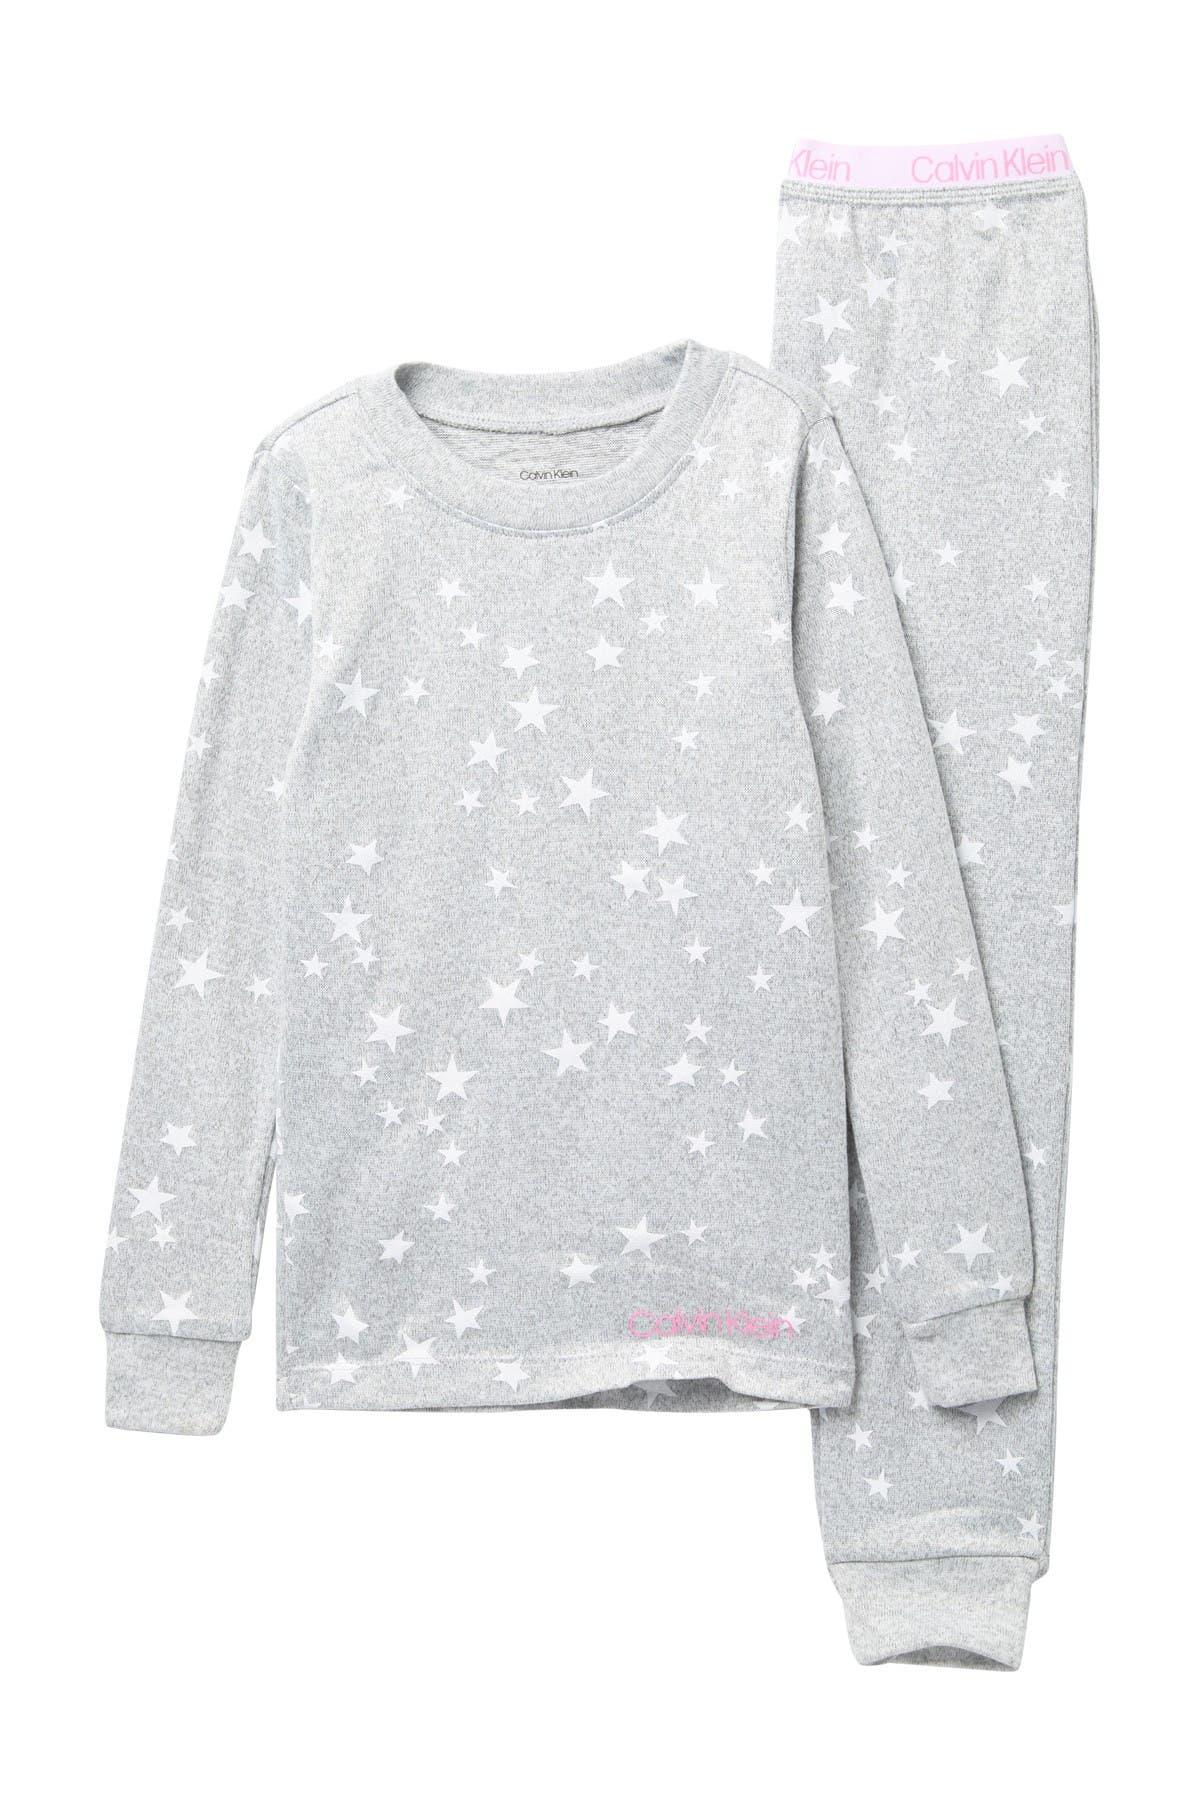 Image of Calvin Klein Star Print Long Sleeve Top & Pants Pajama Set